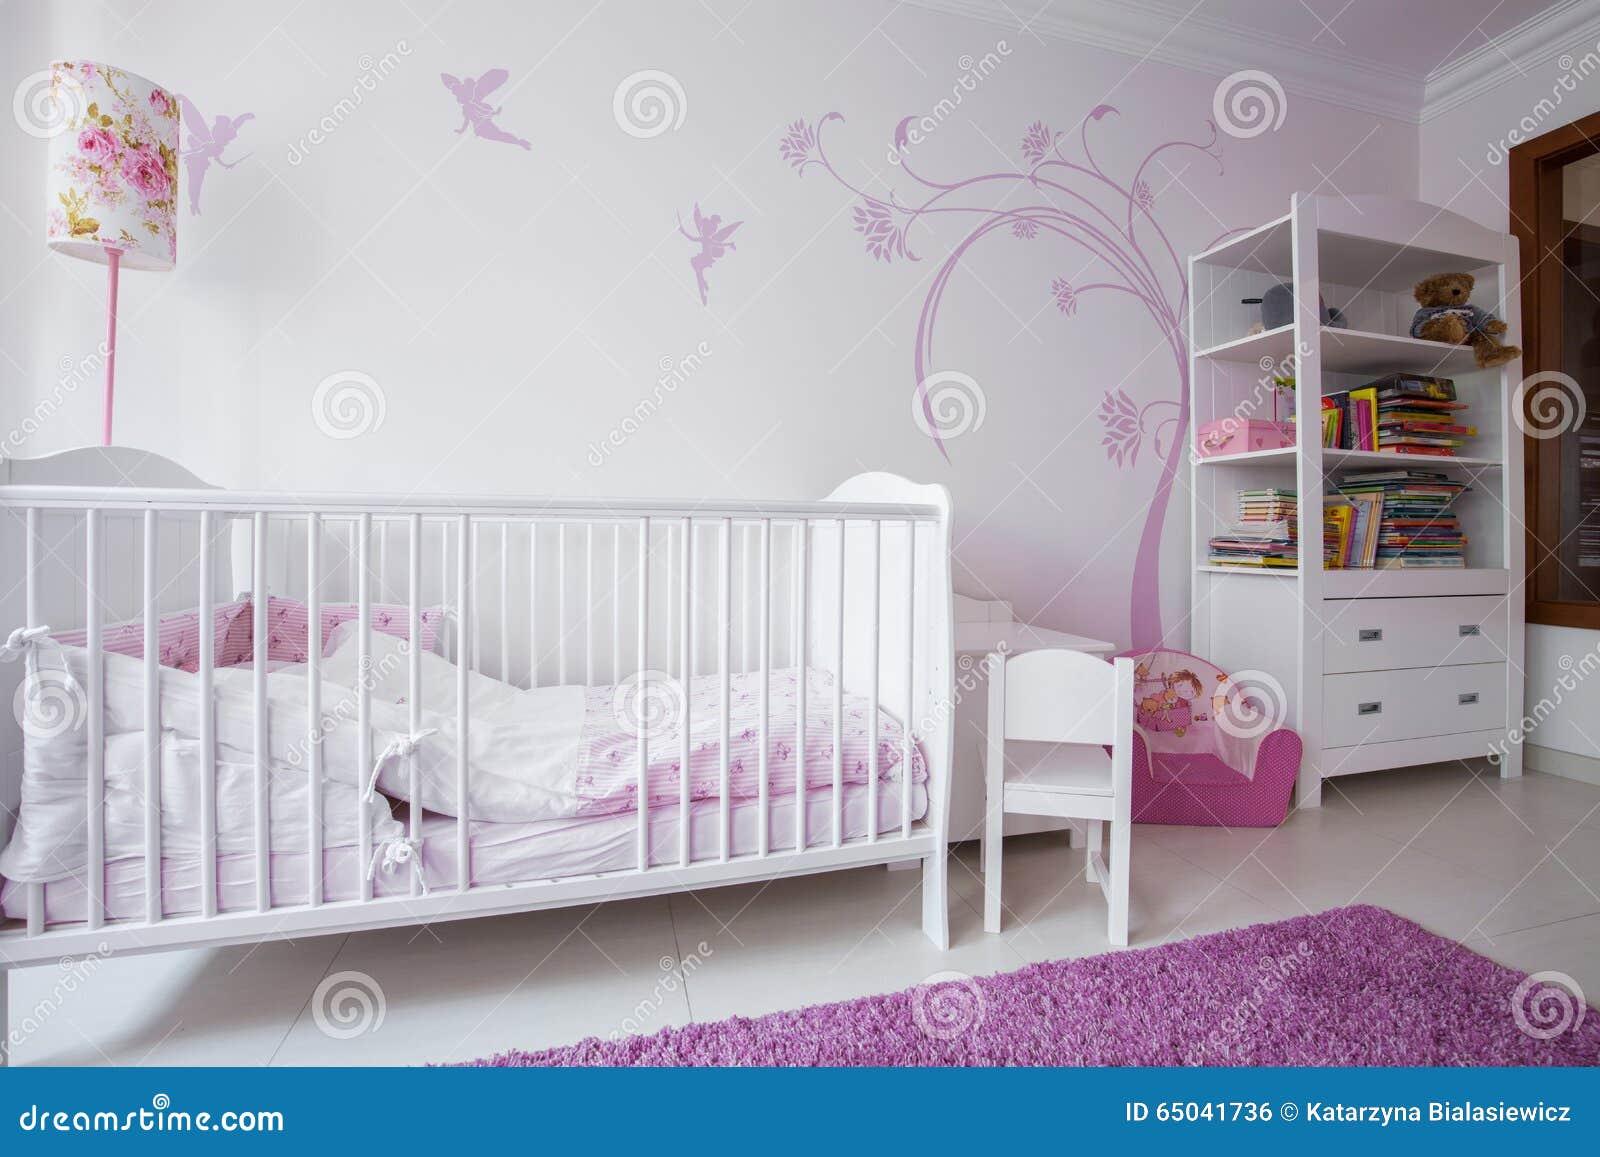 White crib in cozy nursery